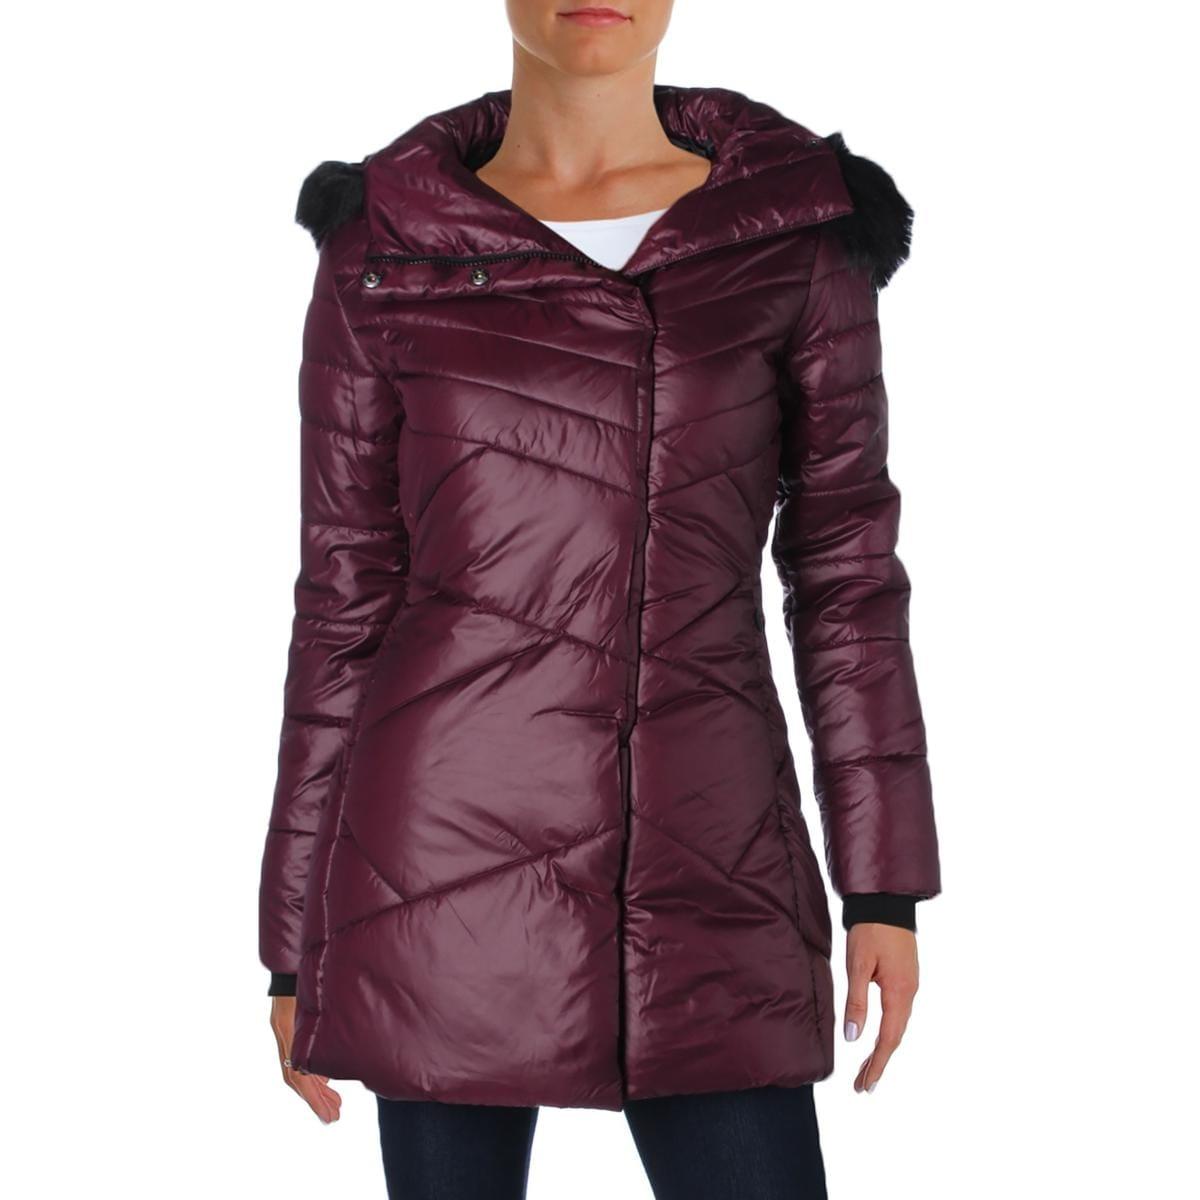 s women salt womens jackets barn jacket evo barns quiksilver washed